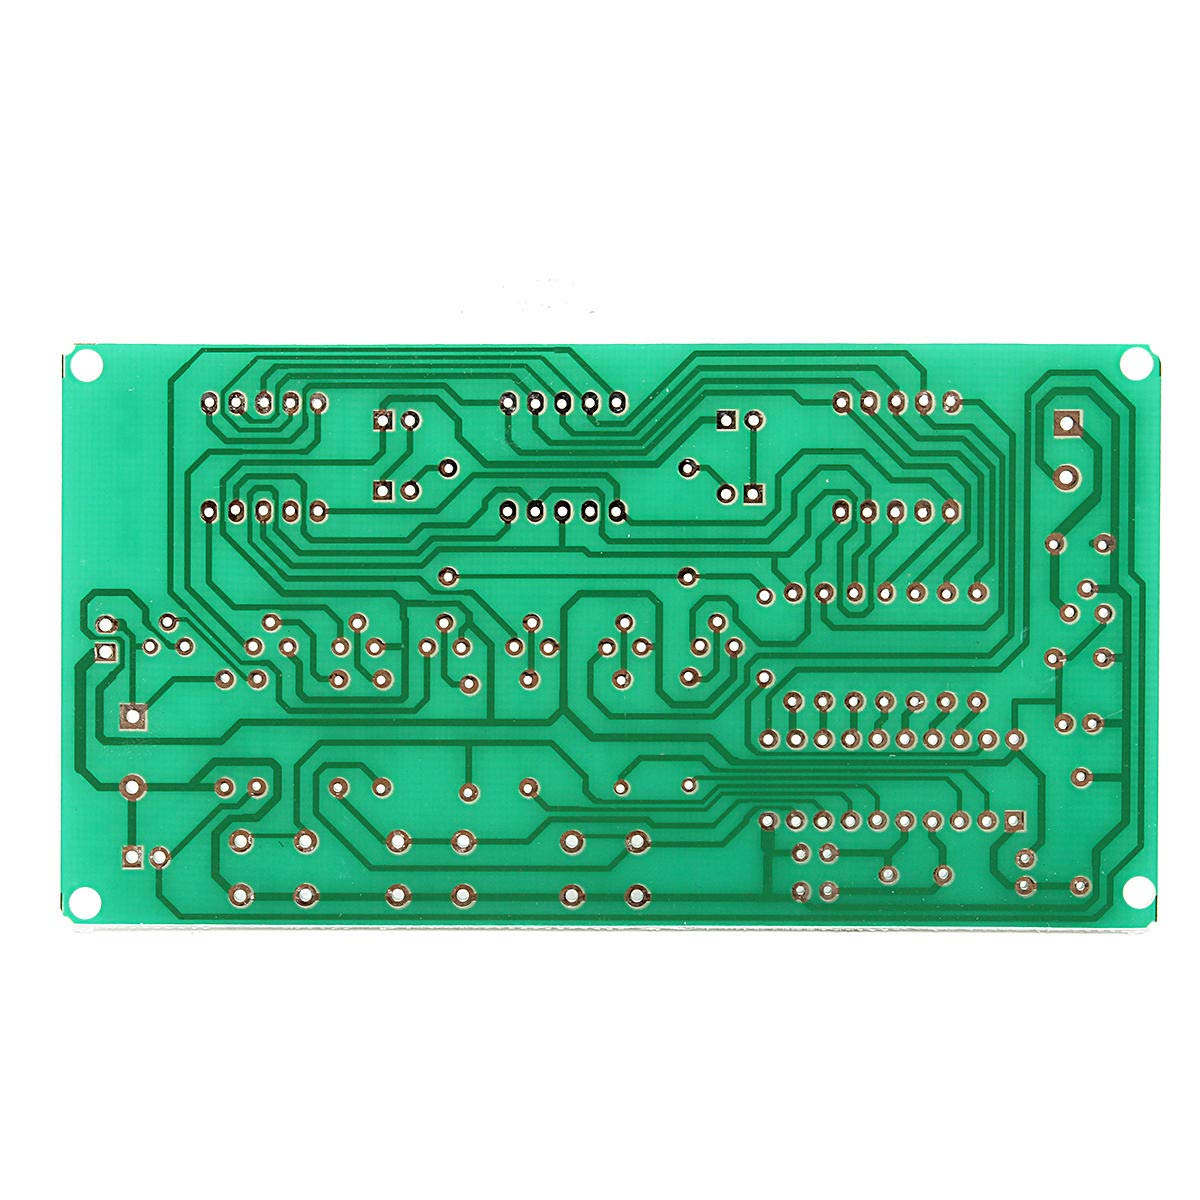 5V-12V AT89C2051 Multifunction Six Digital LED Electronic Clock Kit - Arduino Compatible SCM & DIY Kits Arduino Compatible Kits & DIY Kits - 1 x LED ...